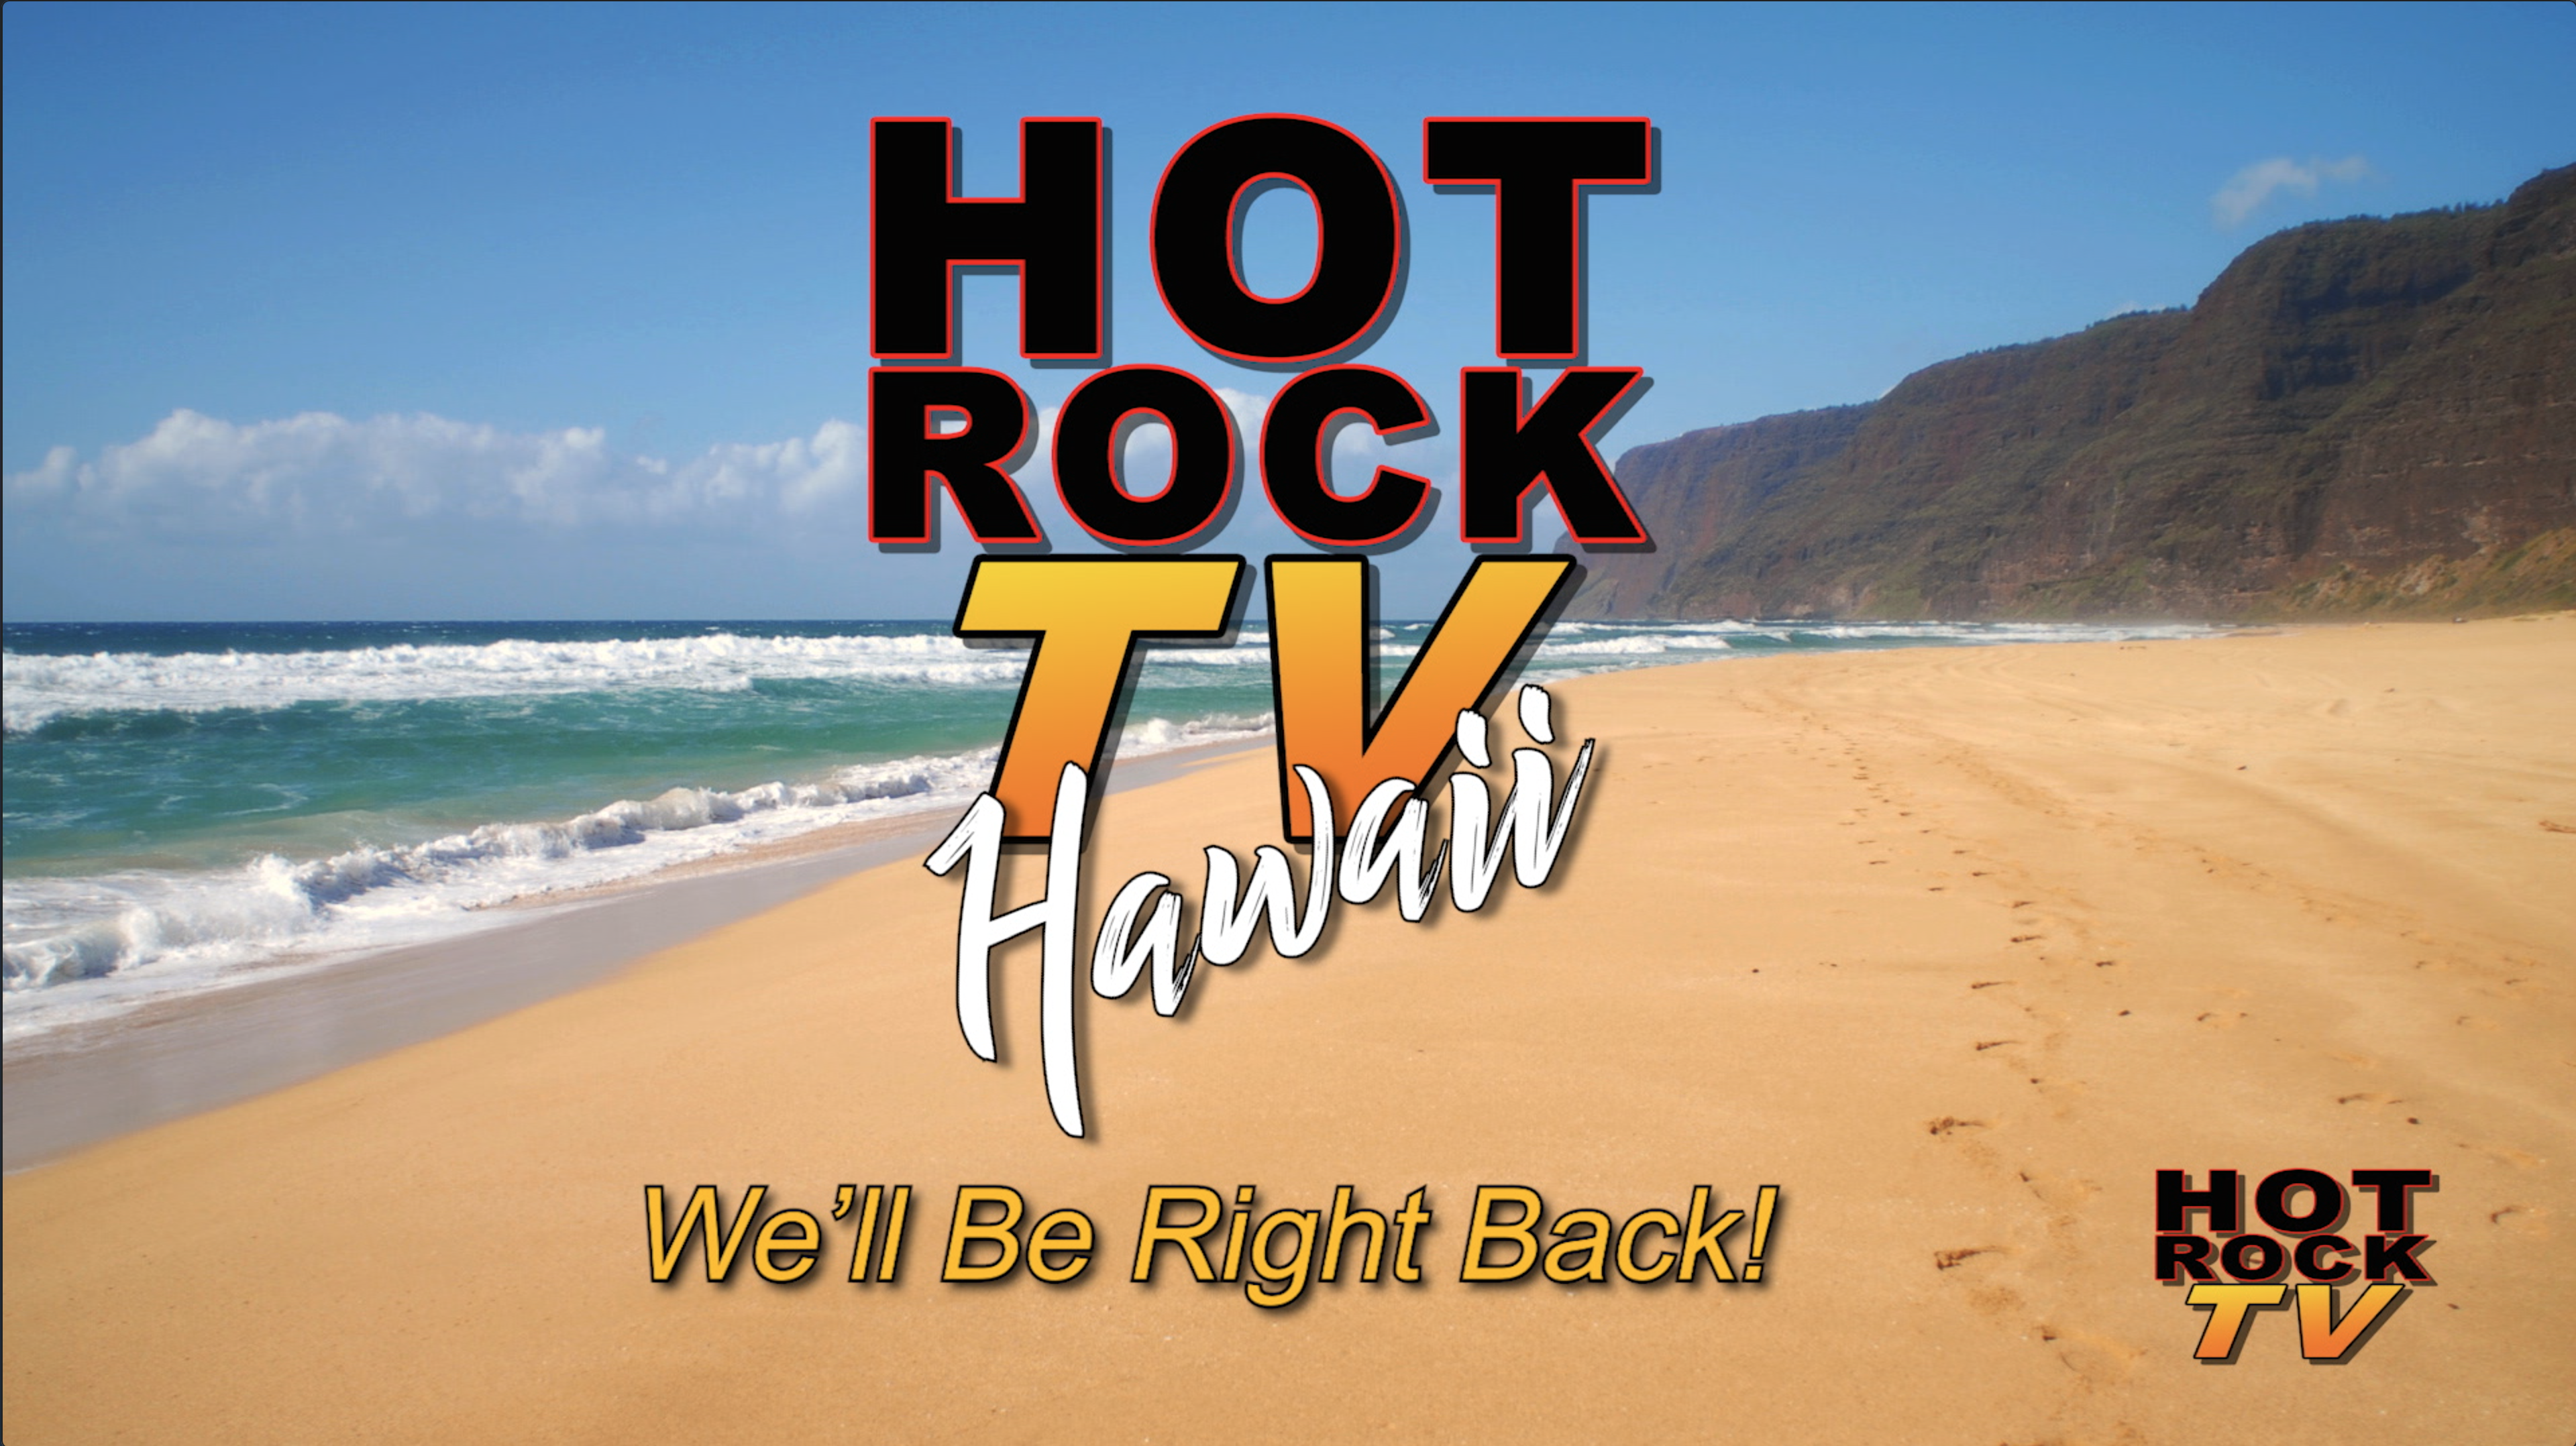 HOT ROCK TV 2